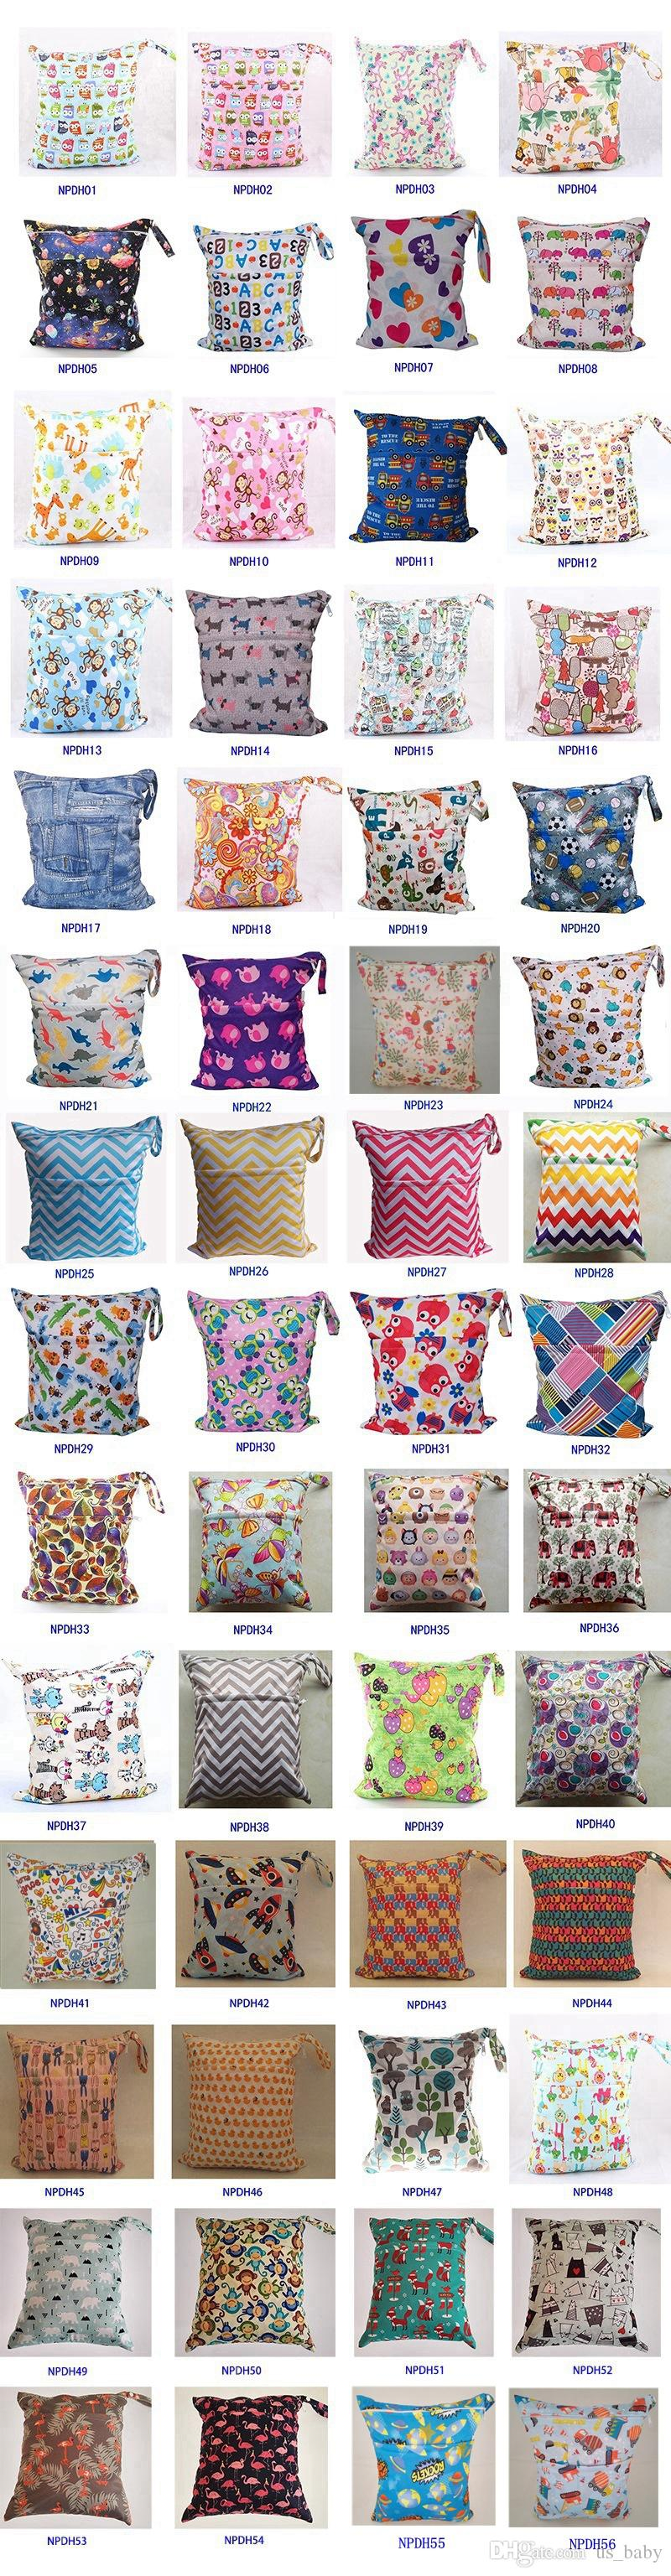 36*28cm pattern Double Zippered baby print cartoon waterproof wet dry diaper bag wet for babies pocket storage bag